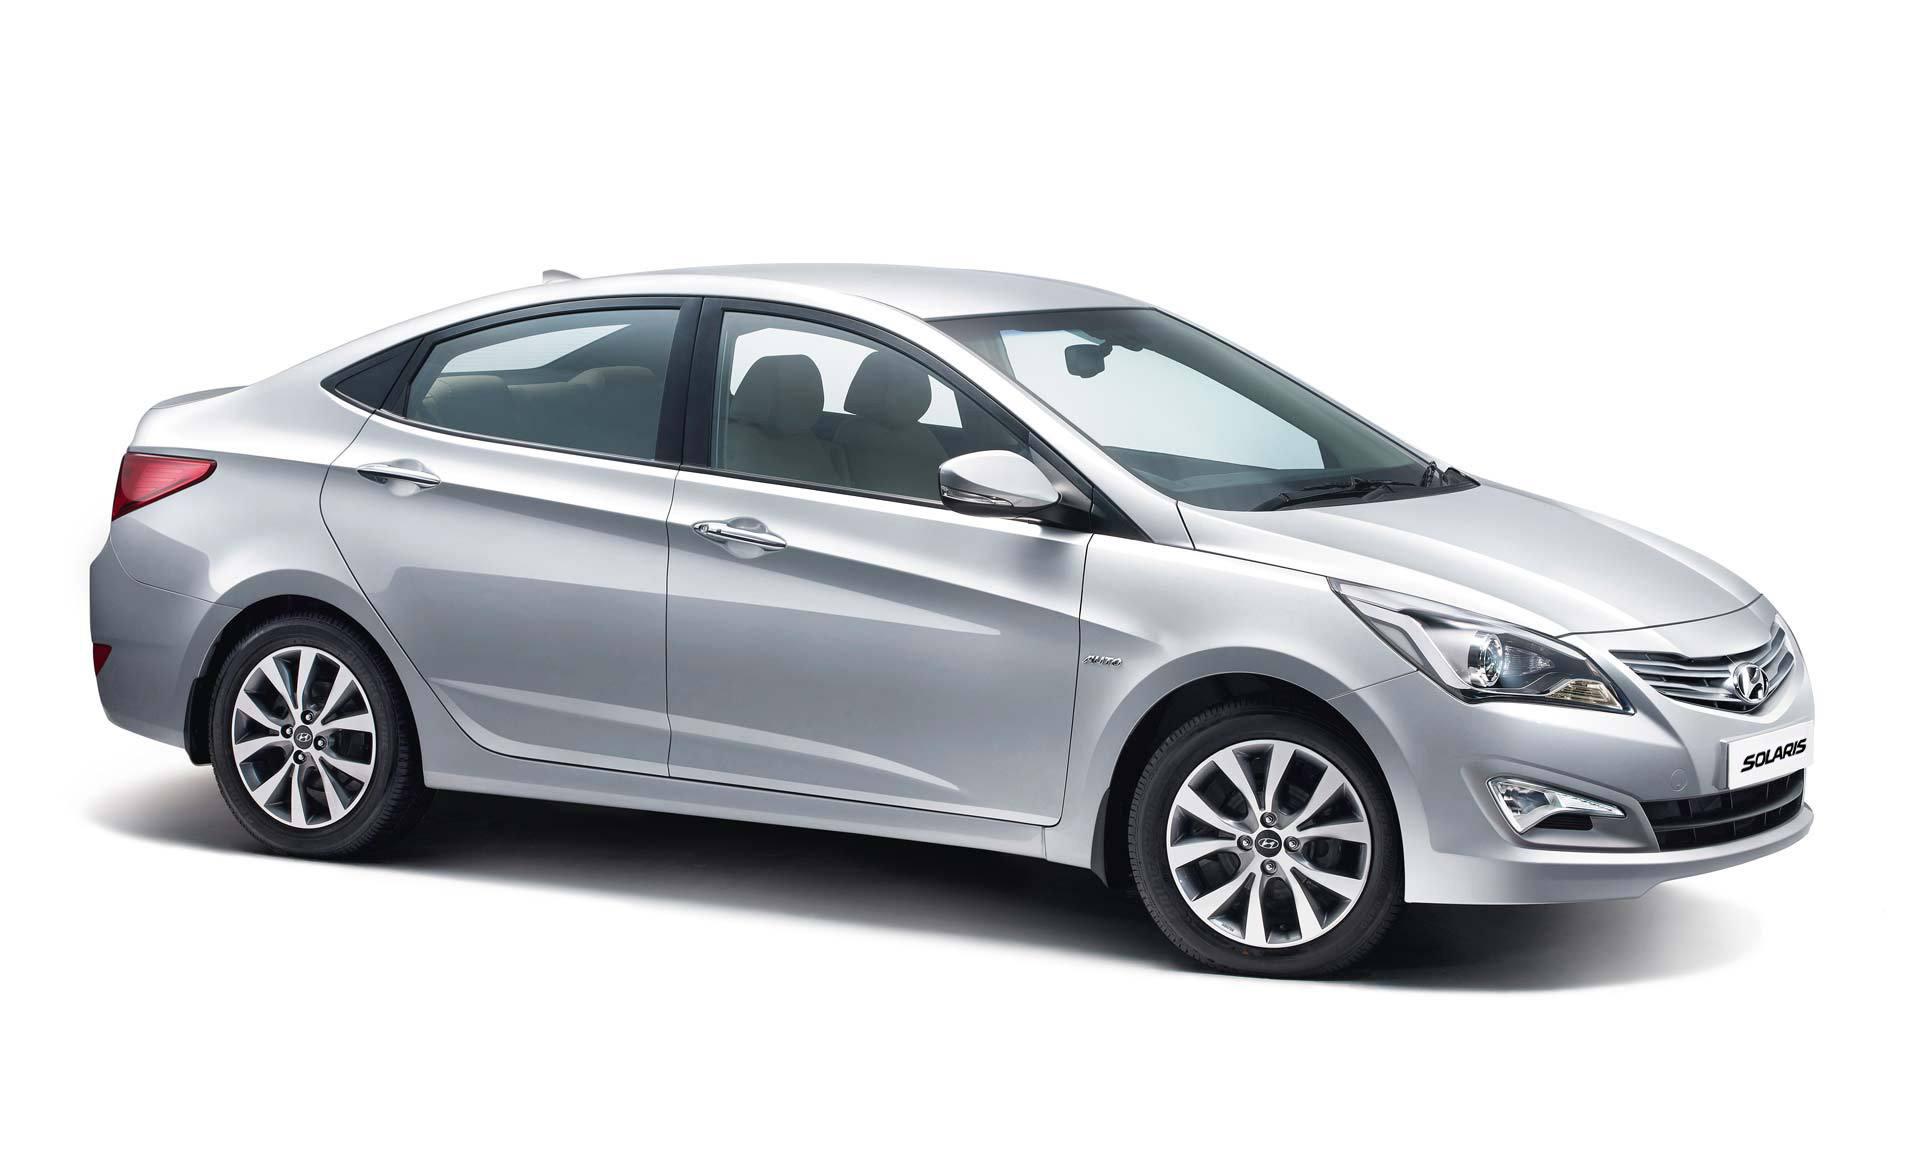 Hyundai Solaris 2019 GL in Egypt: New Car Prices, Specs ...